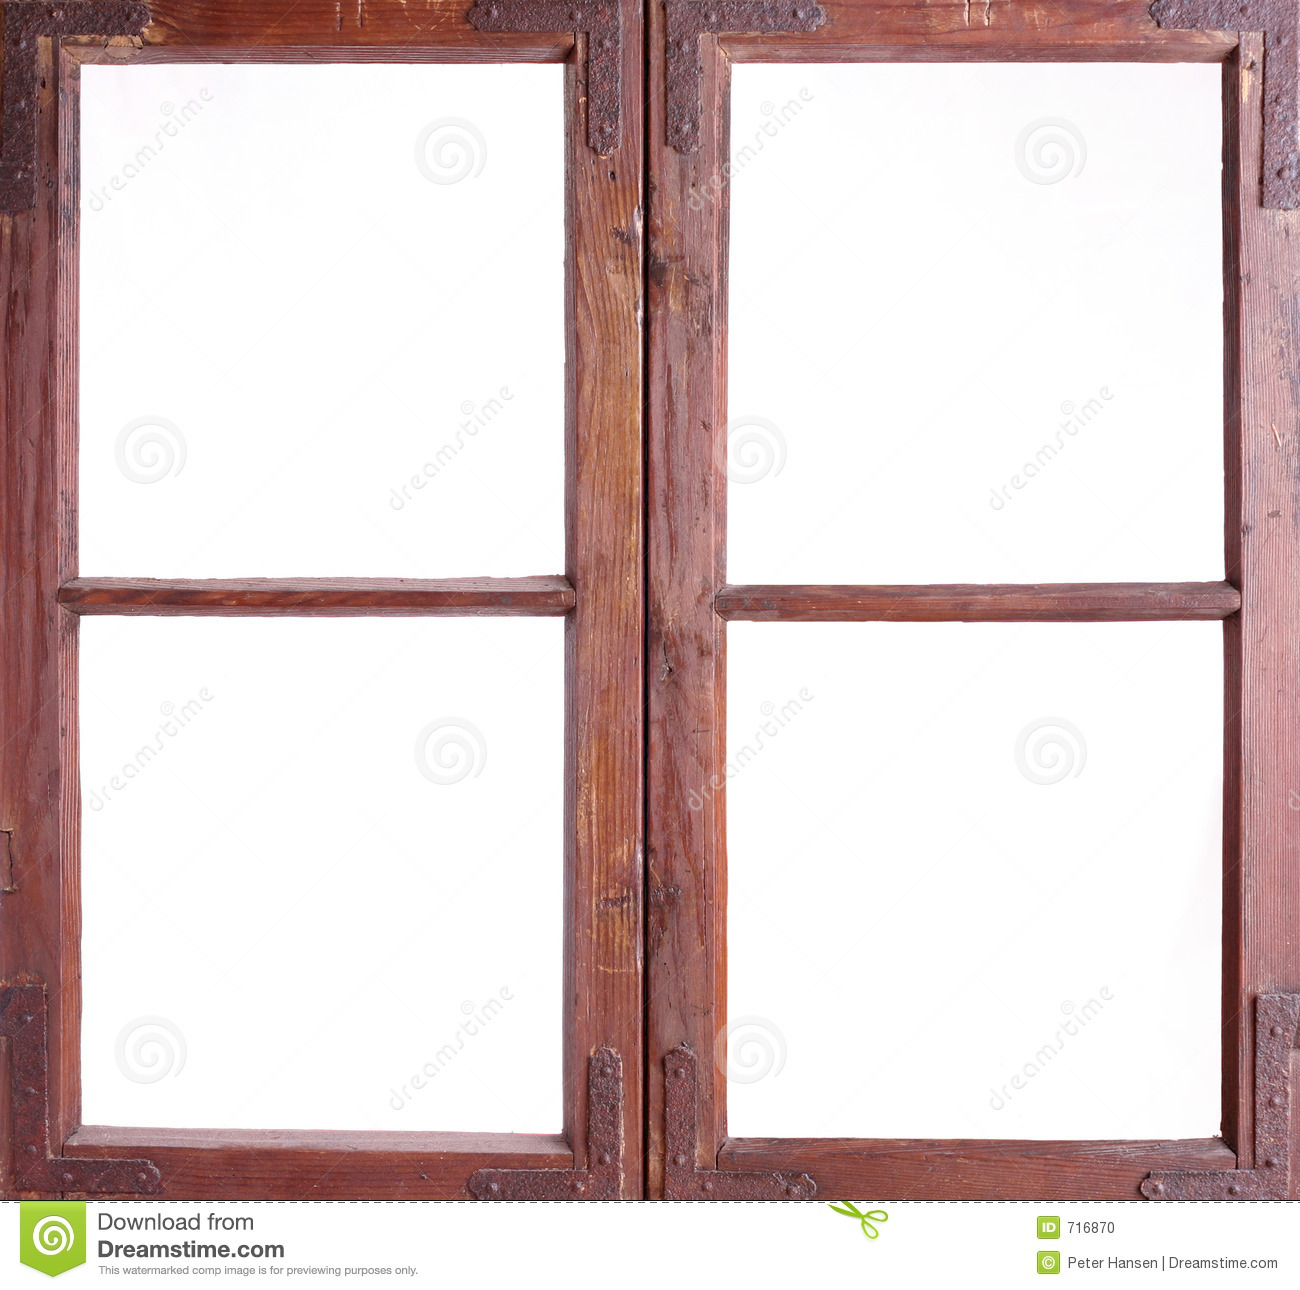 Window Frame Clipart - Clipart Kid